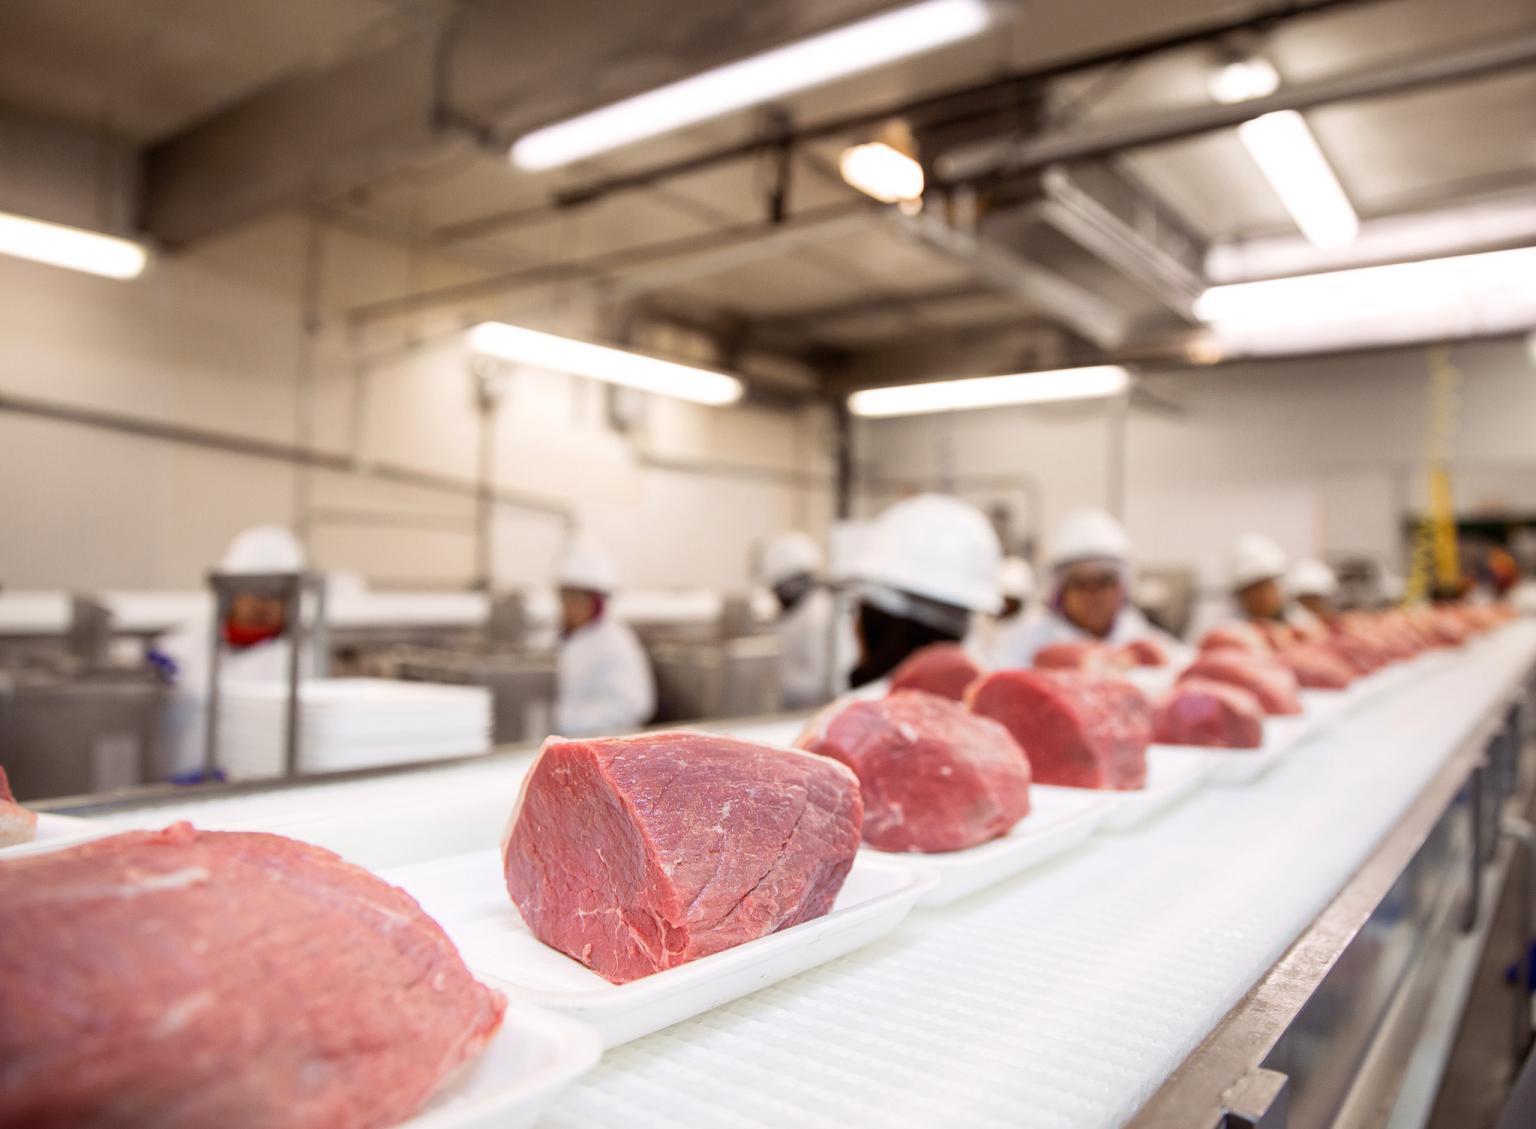 UK: Lubricating the Halal food market